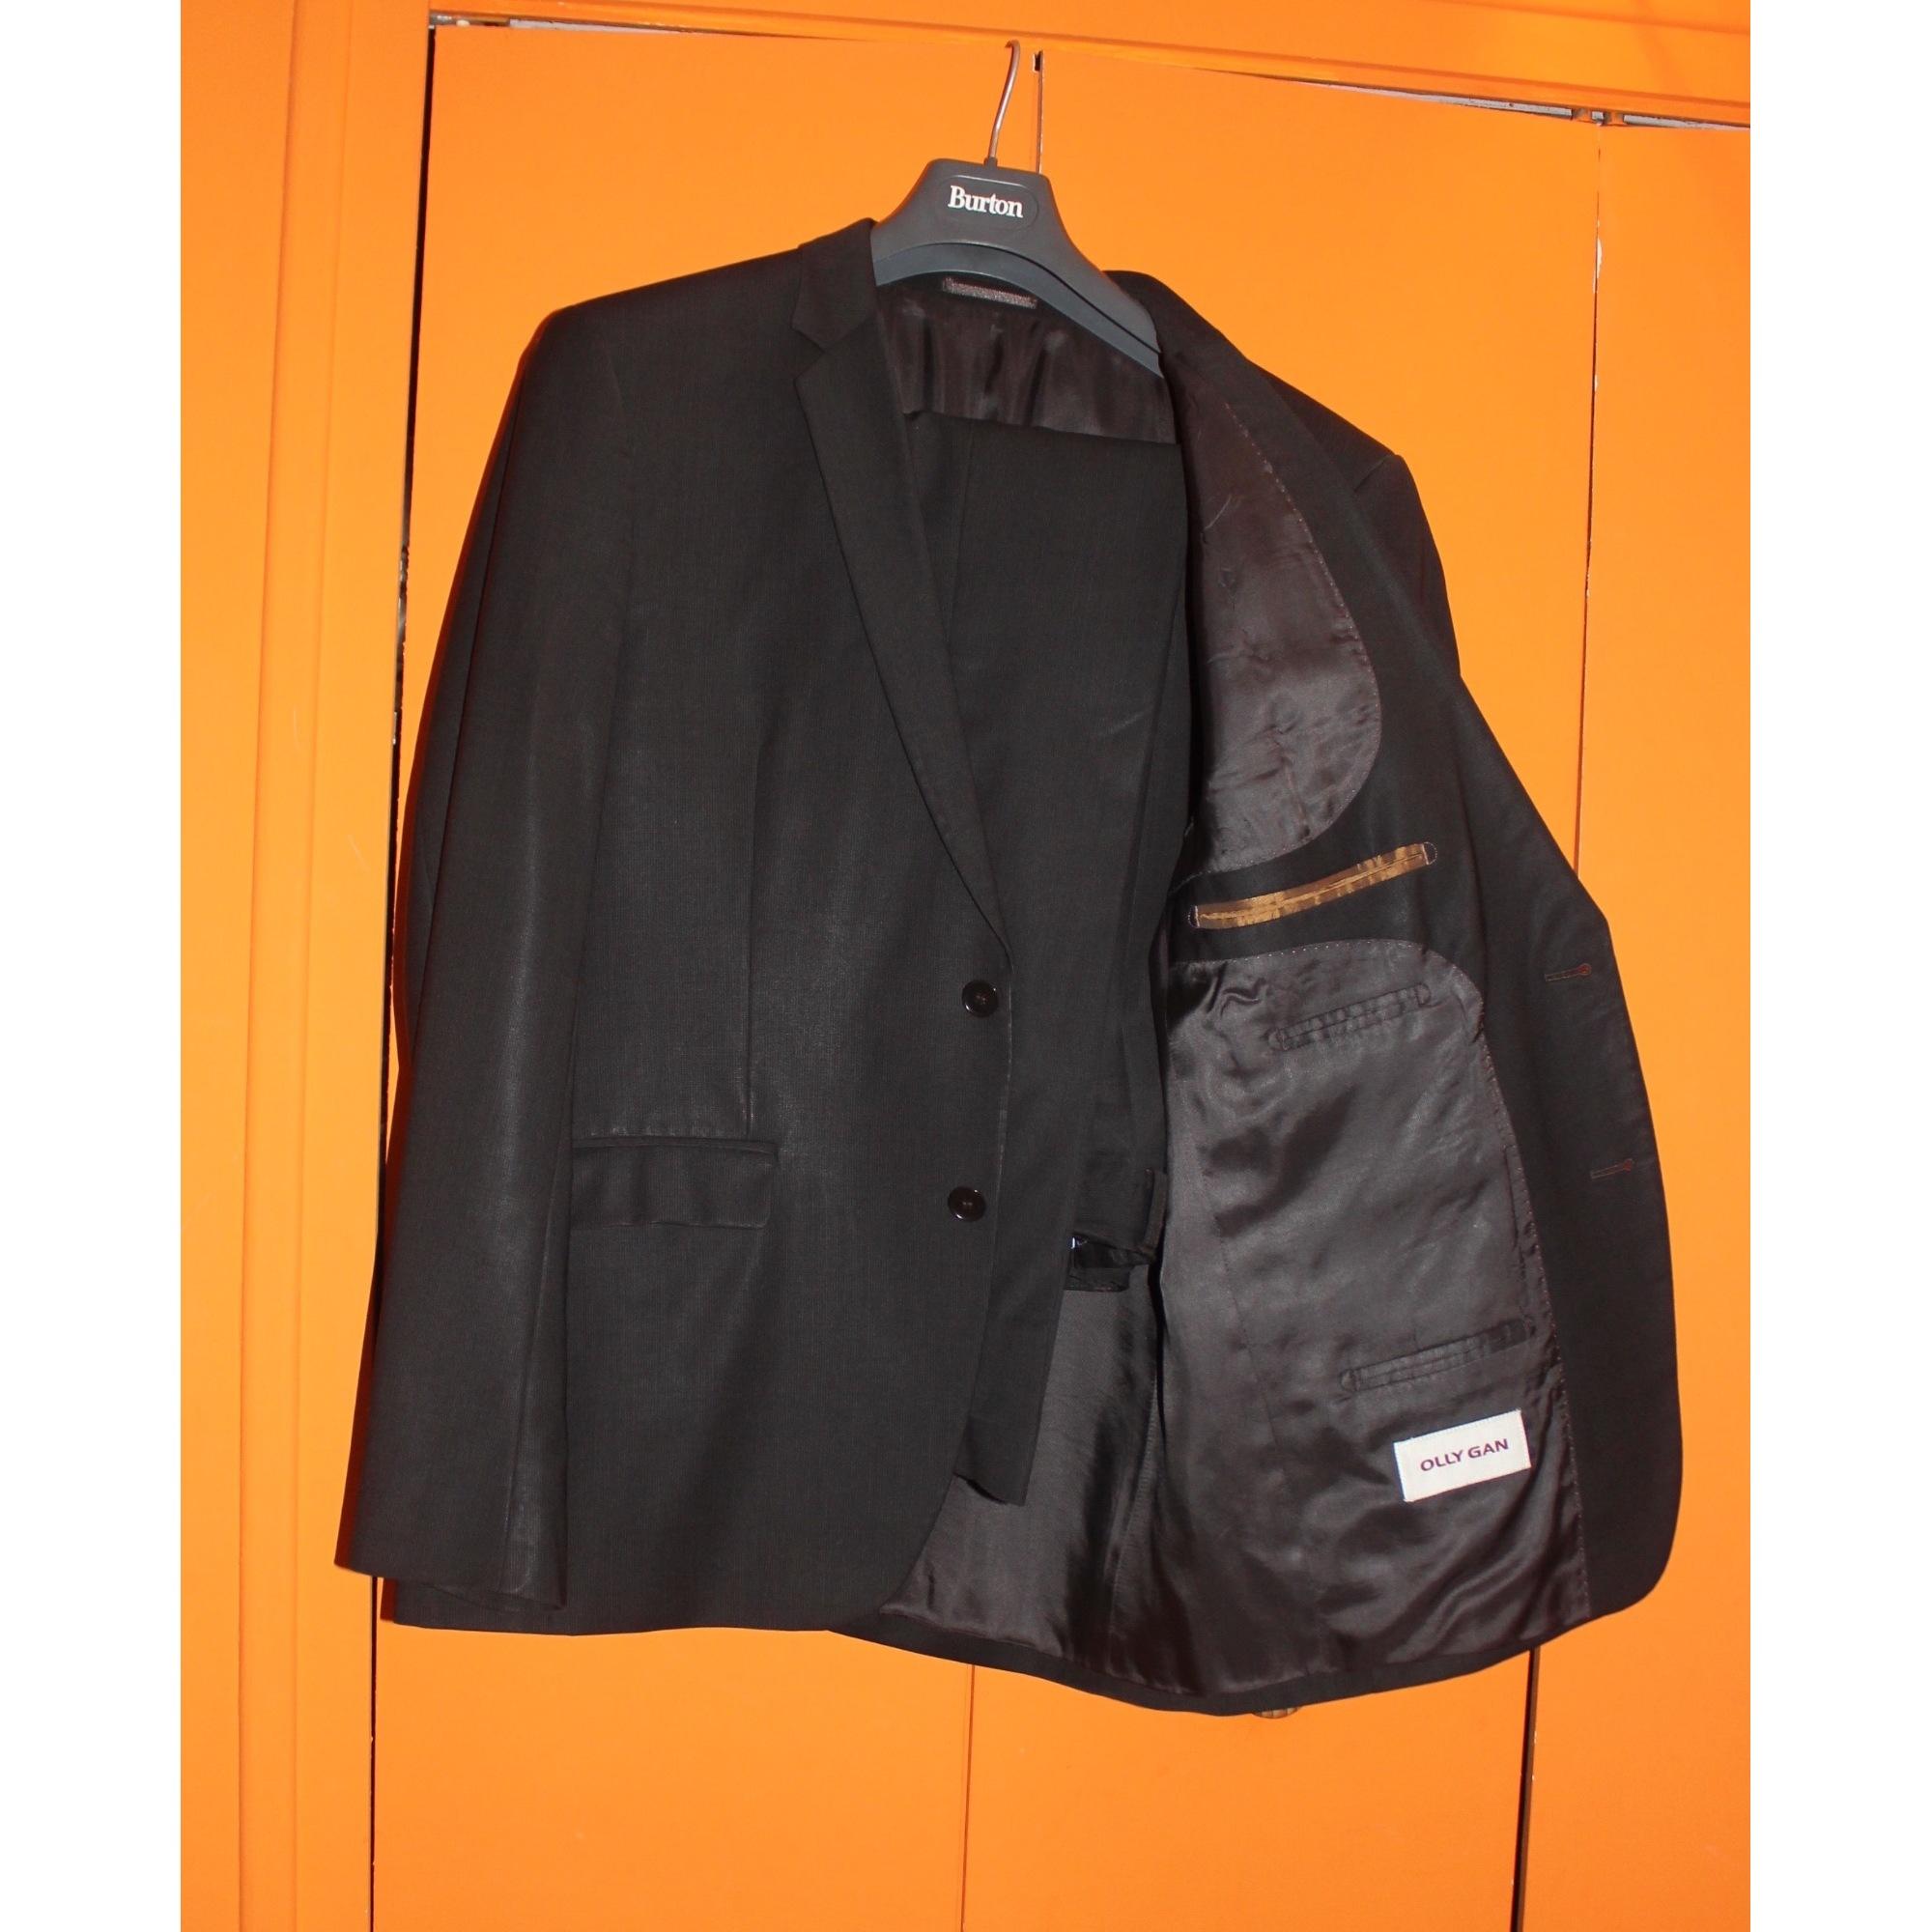 Costume complet OLLY GAN Noir